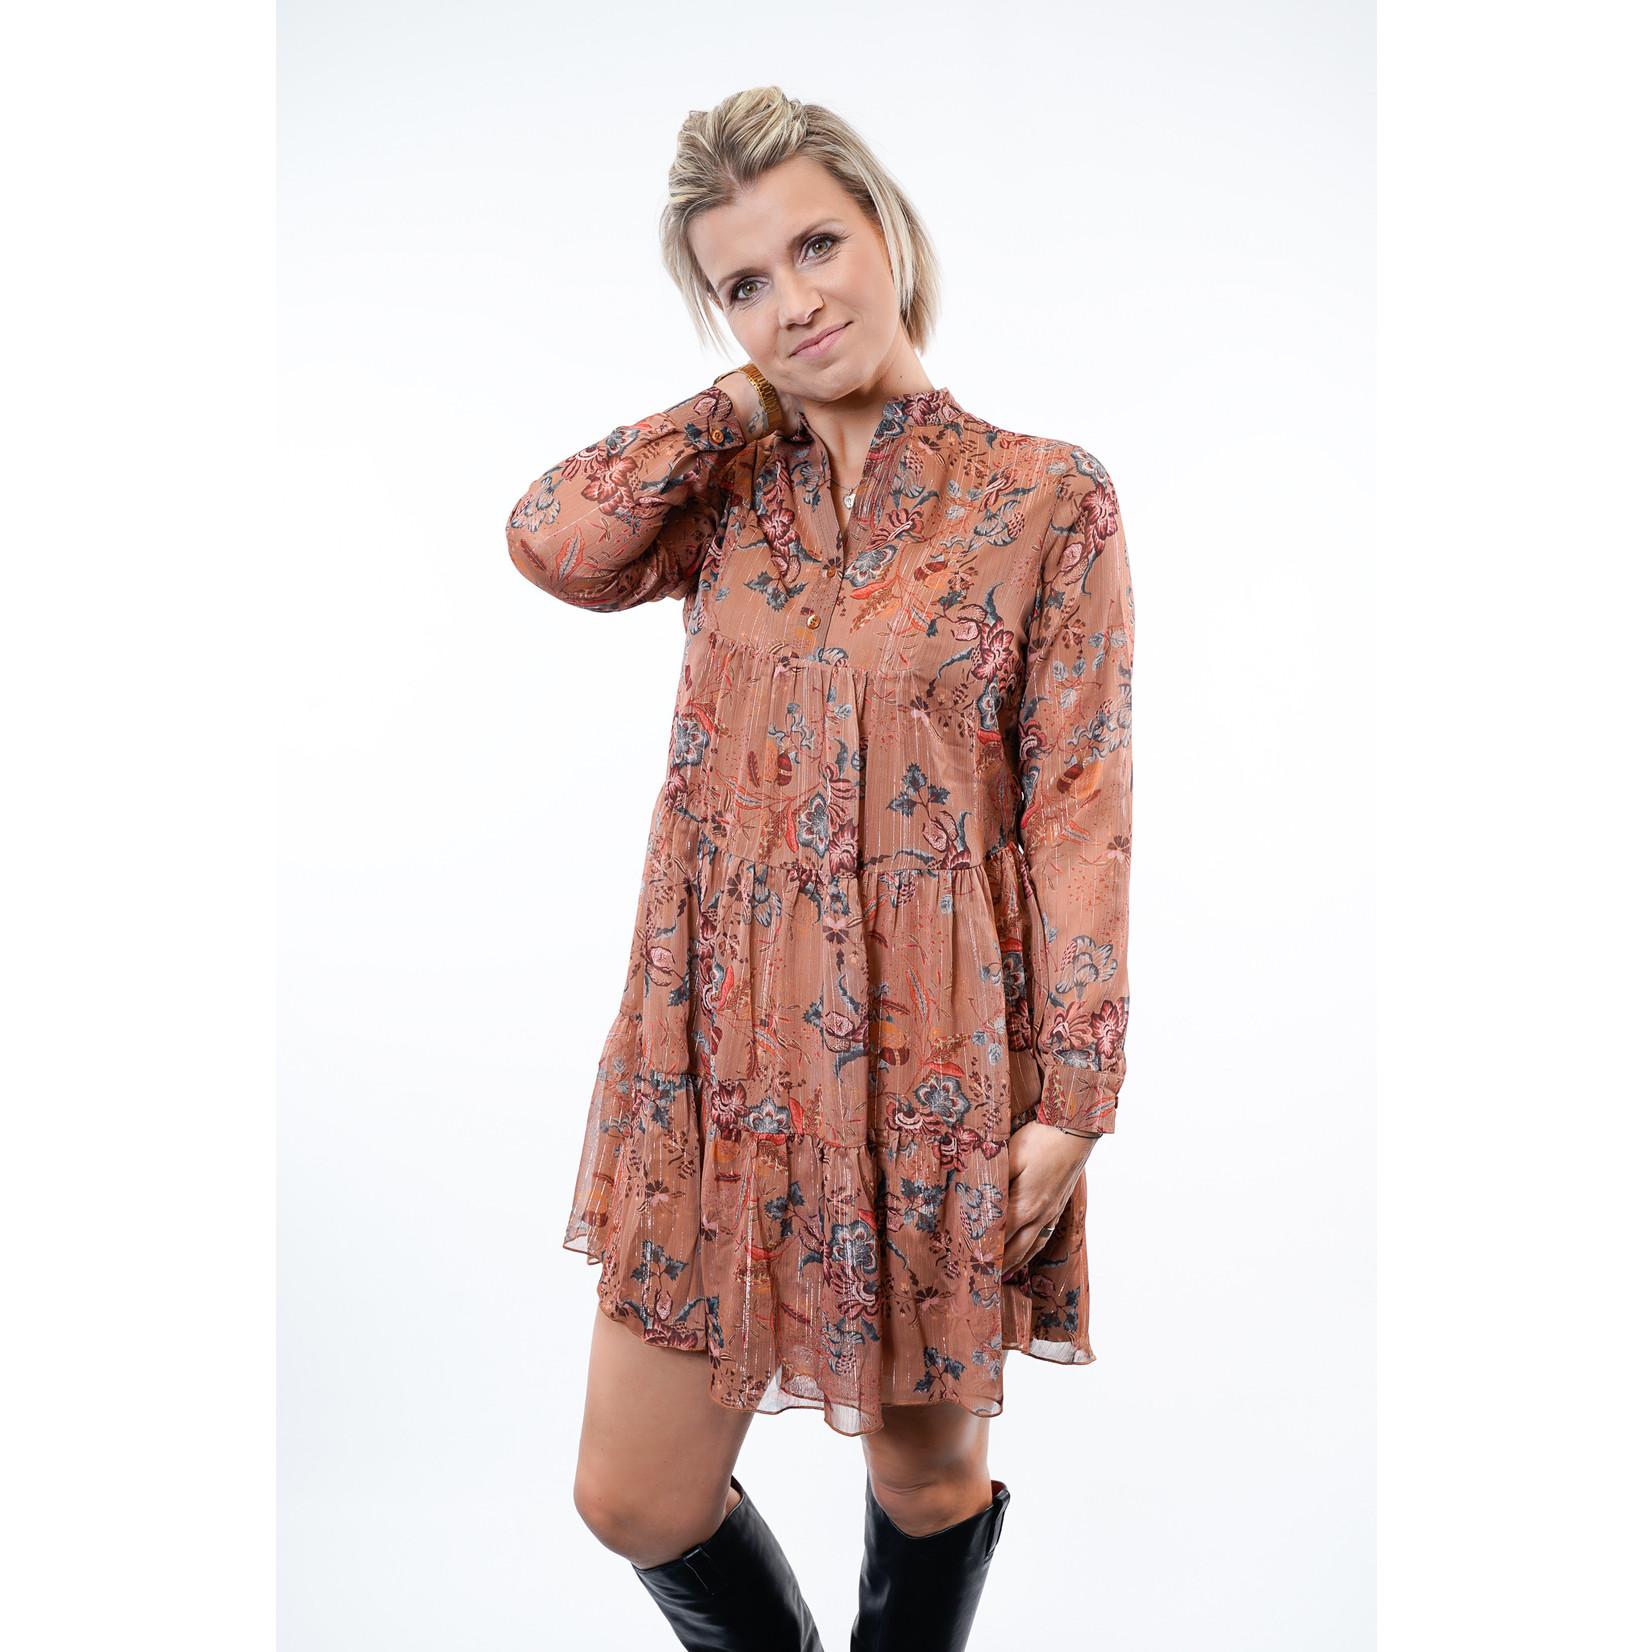 Yentl K Girly dress 14-1